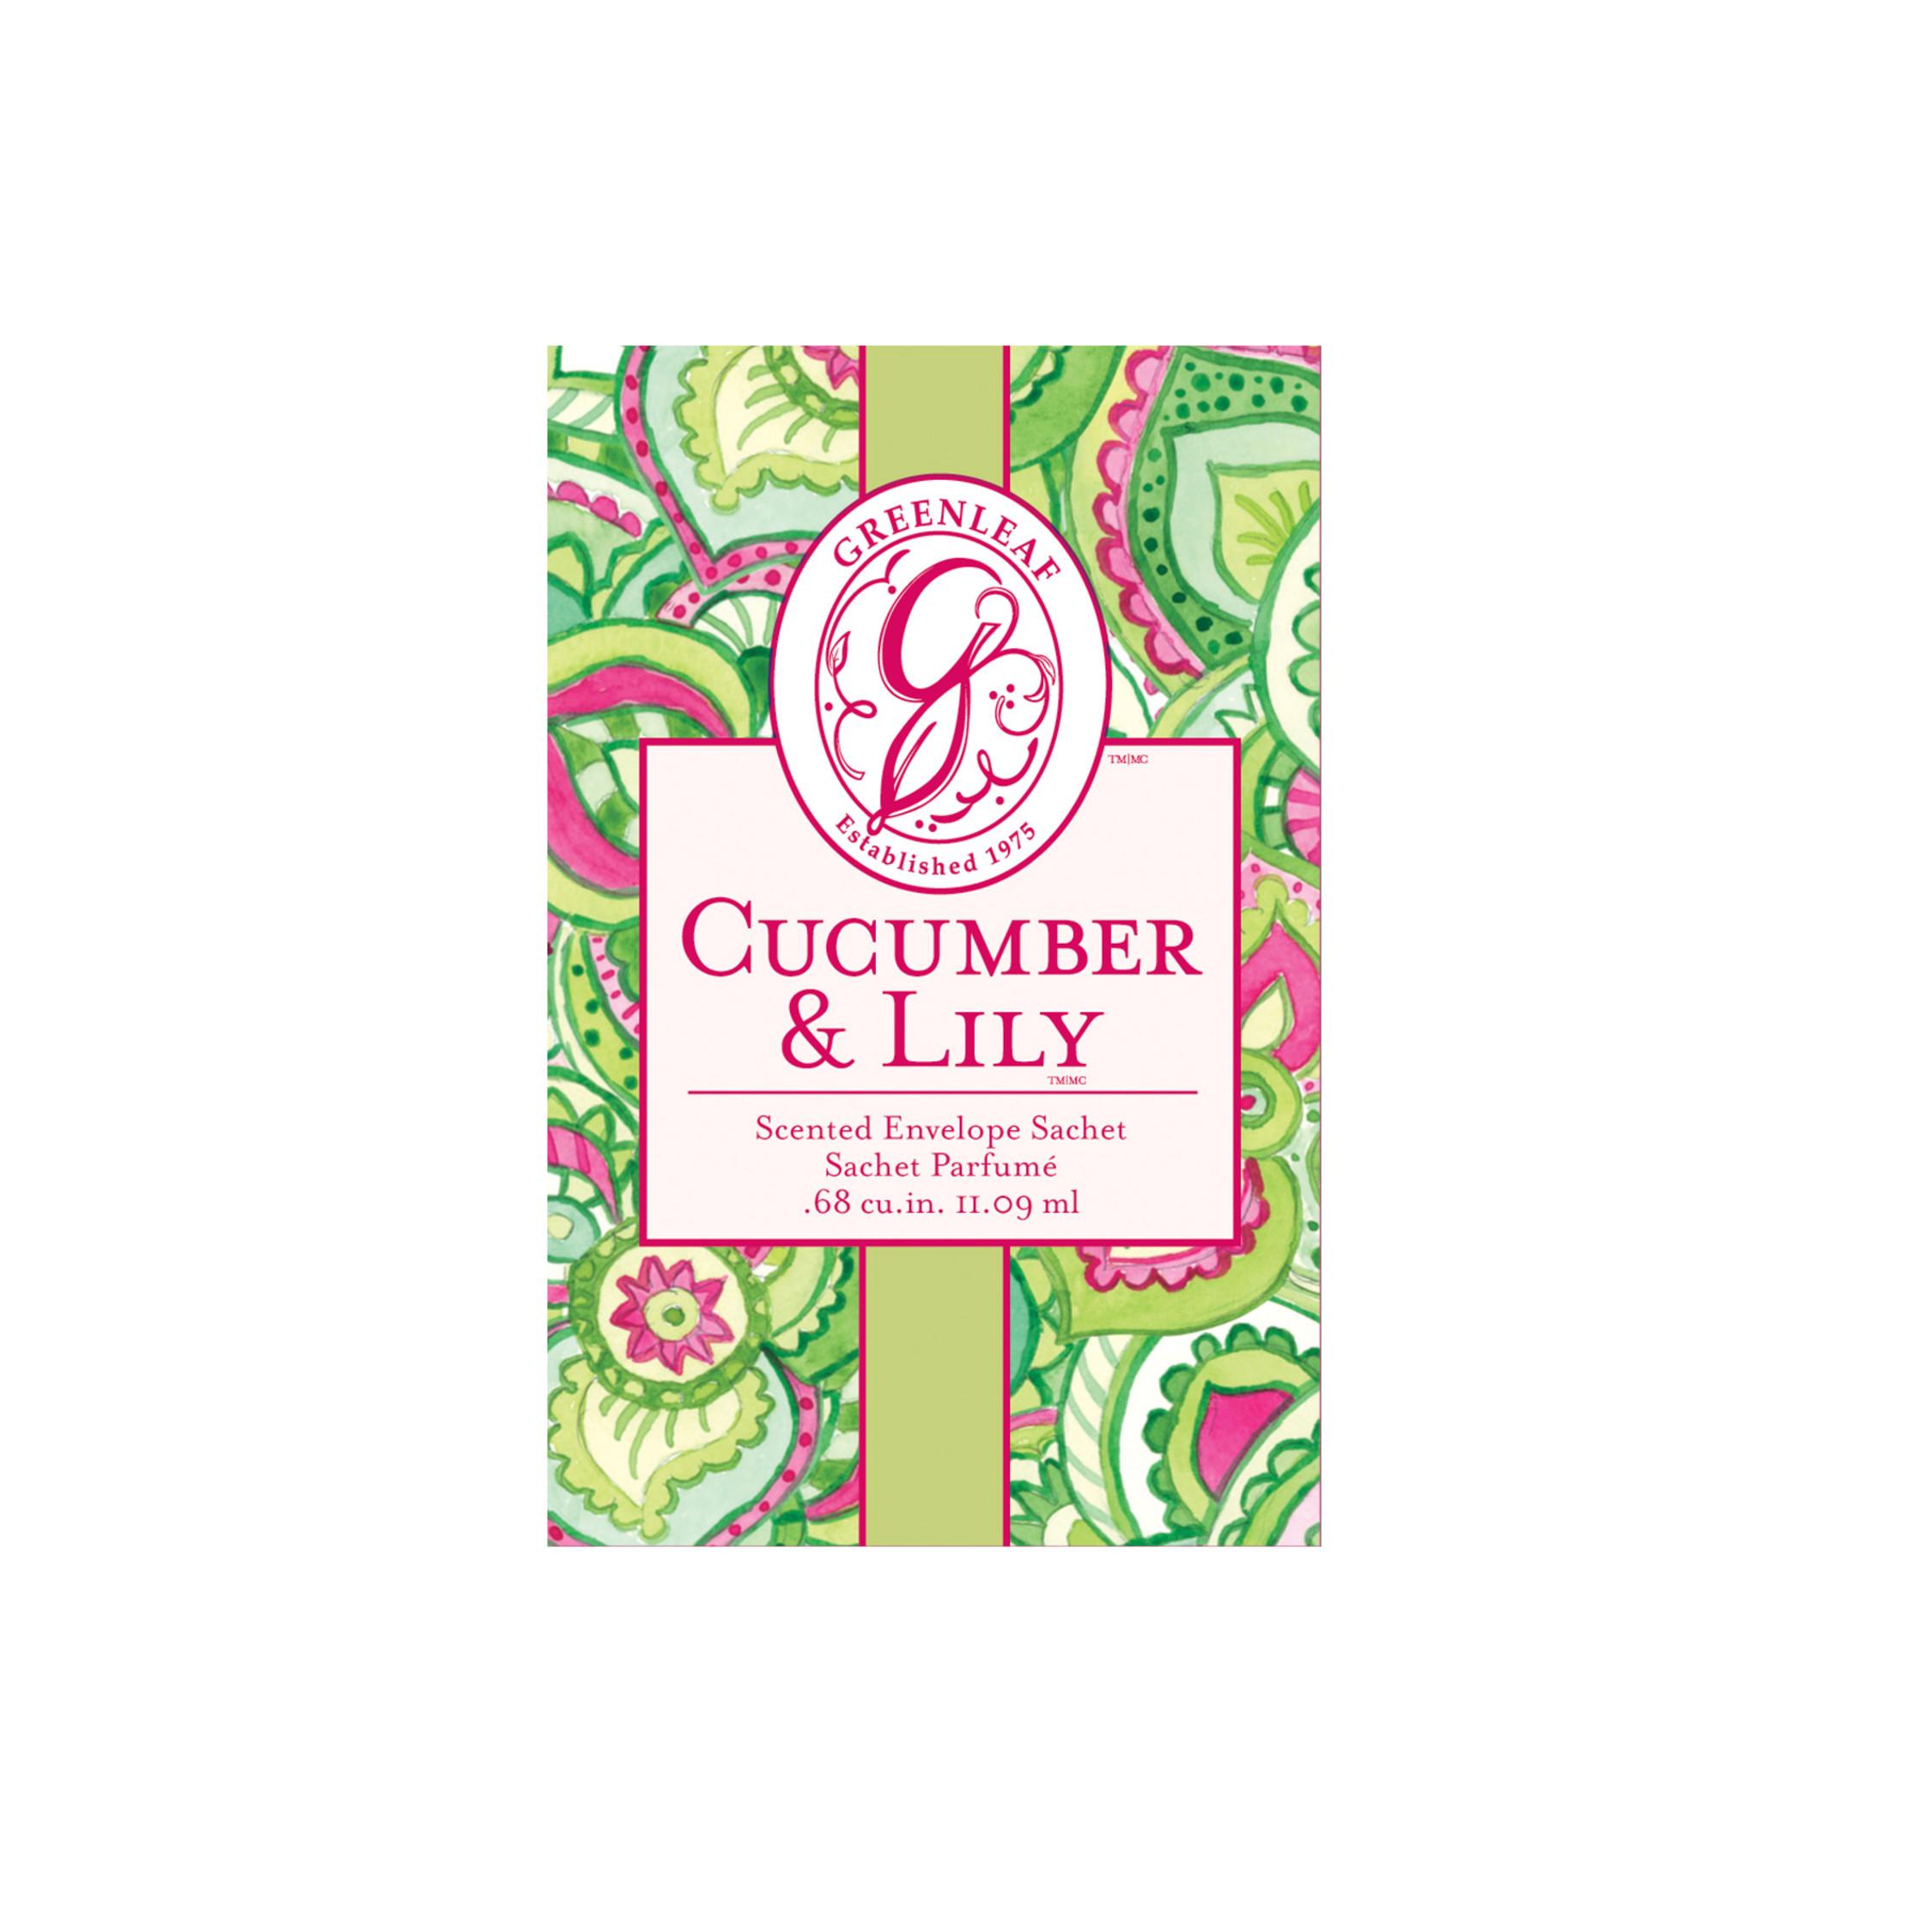 Cucumber & Lily Duftsachet (klein)